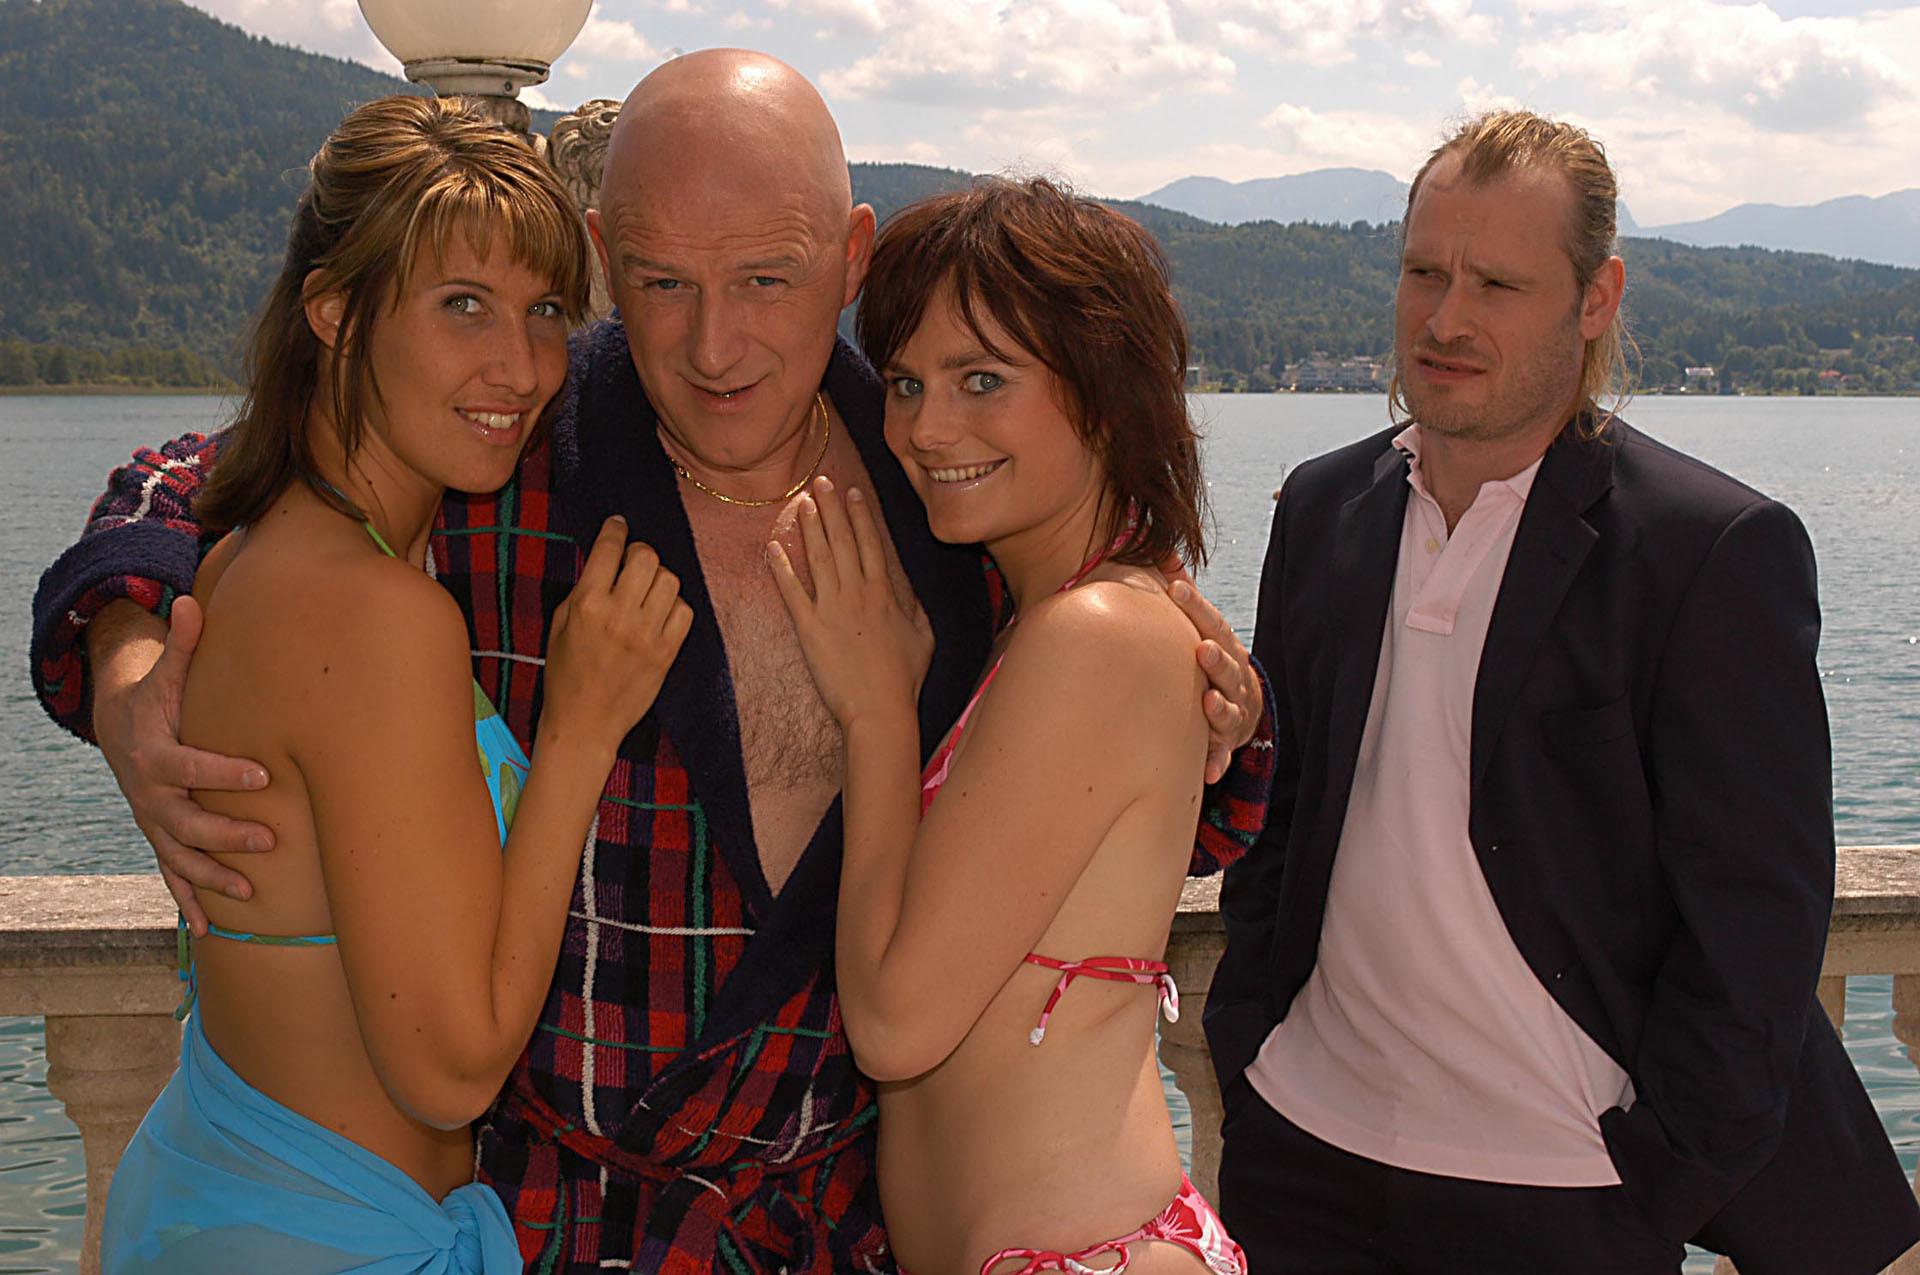 © ORF / Hubert Mican (Star*Film) - Ina Nadine Wagler, Alexander Goebel, Nina Blum, Johannes Krisch